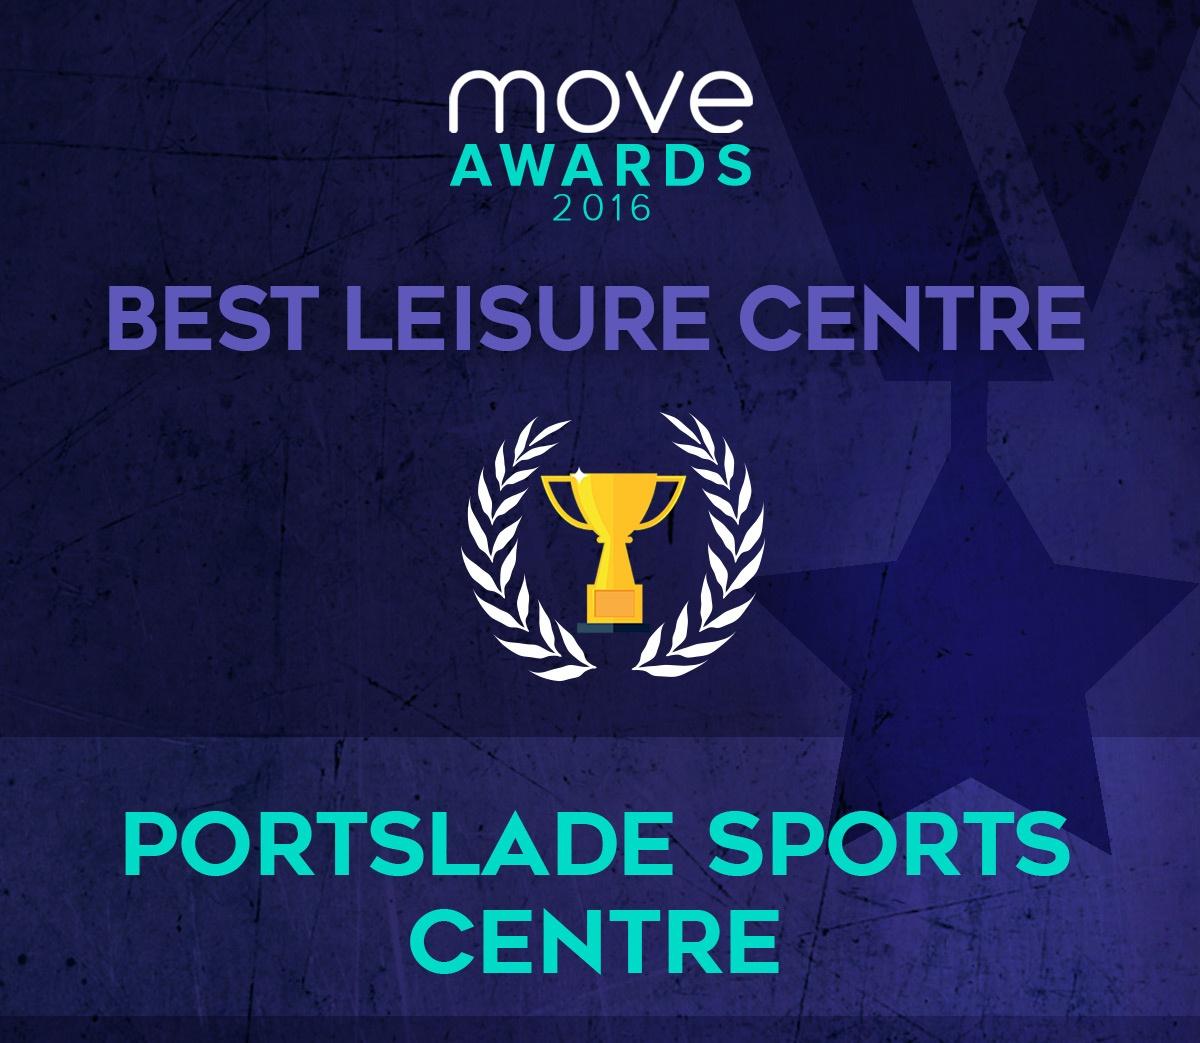 1Portslade-Sports-Centre-est Leisure Centre-BandH.jpg